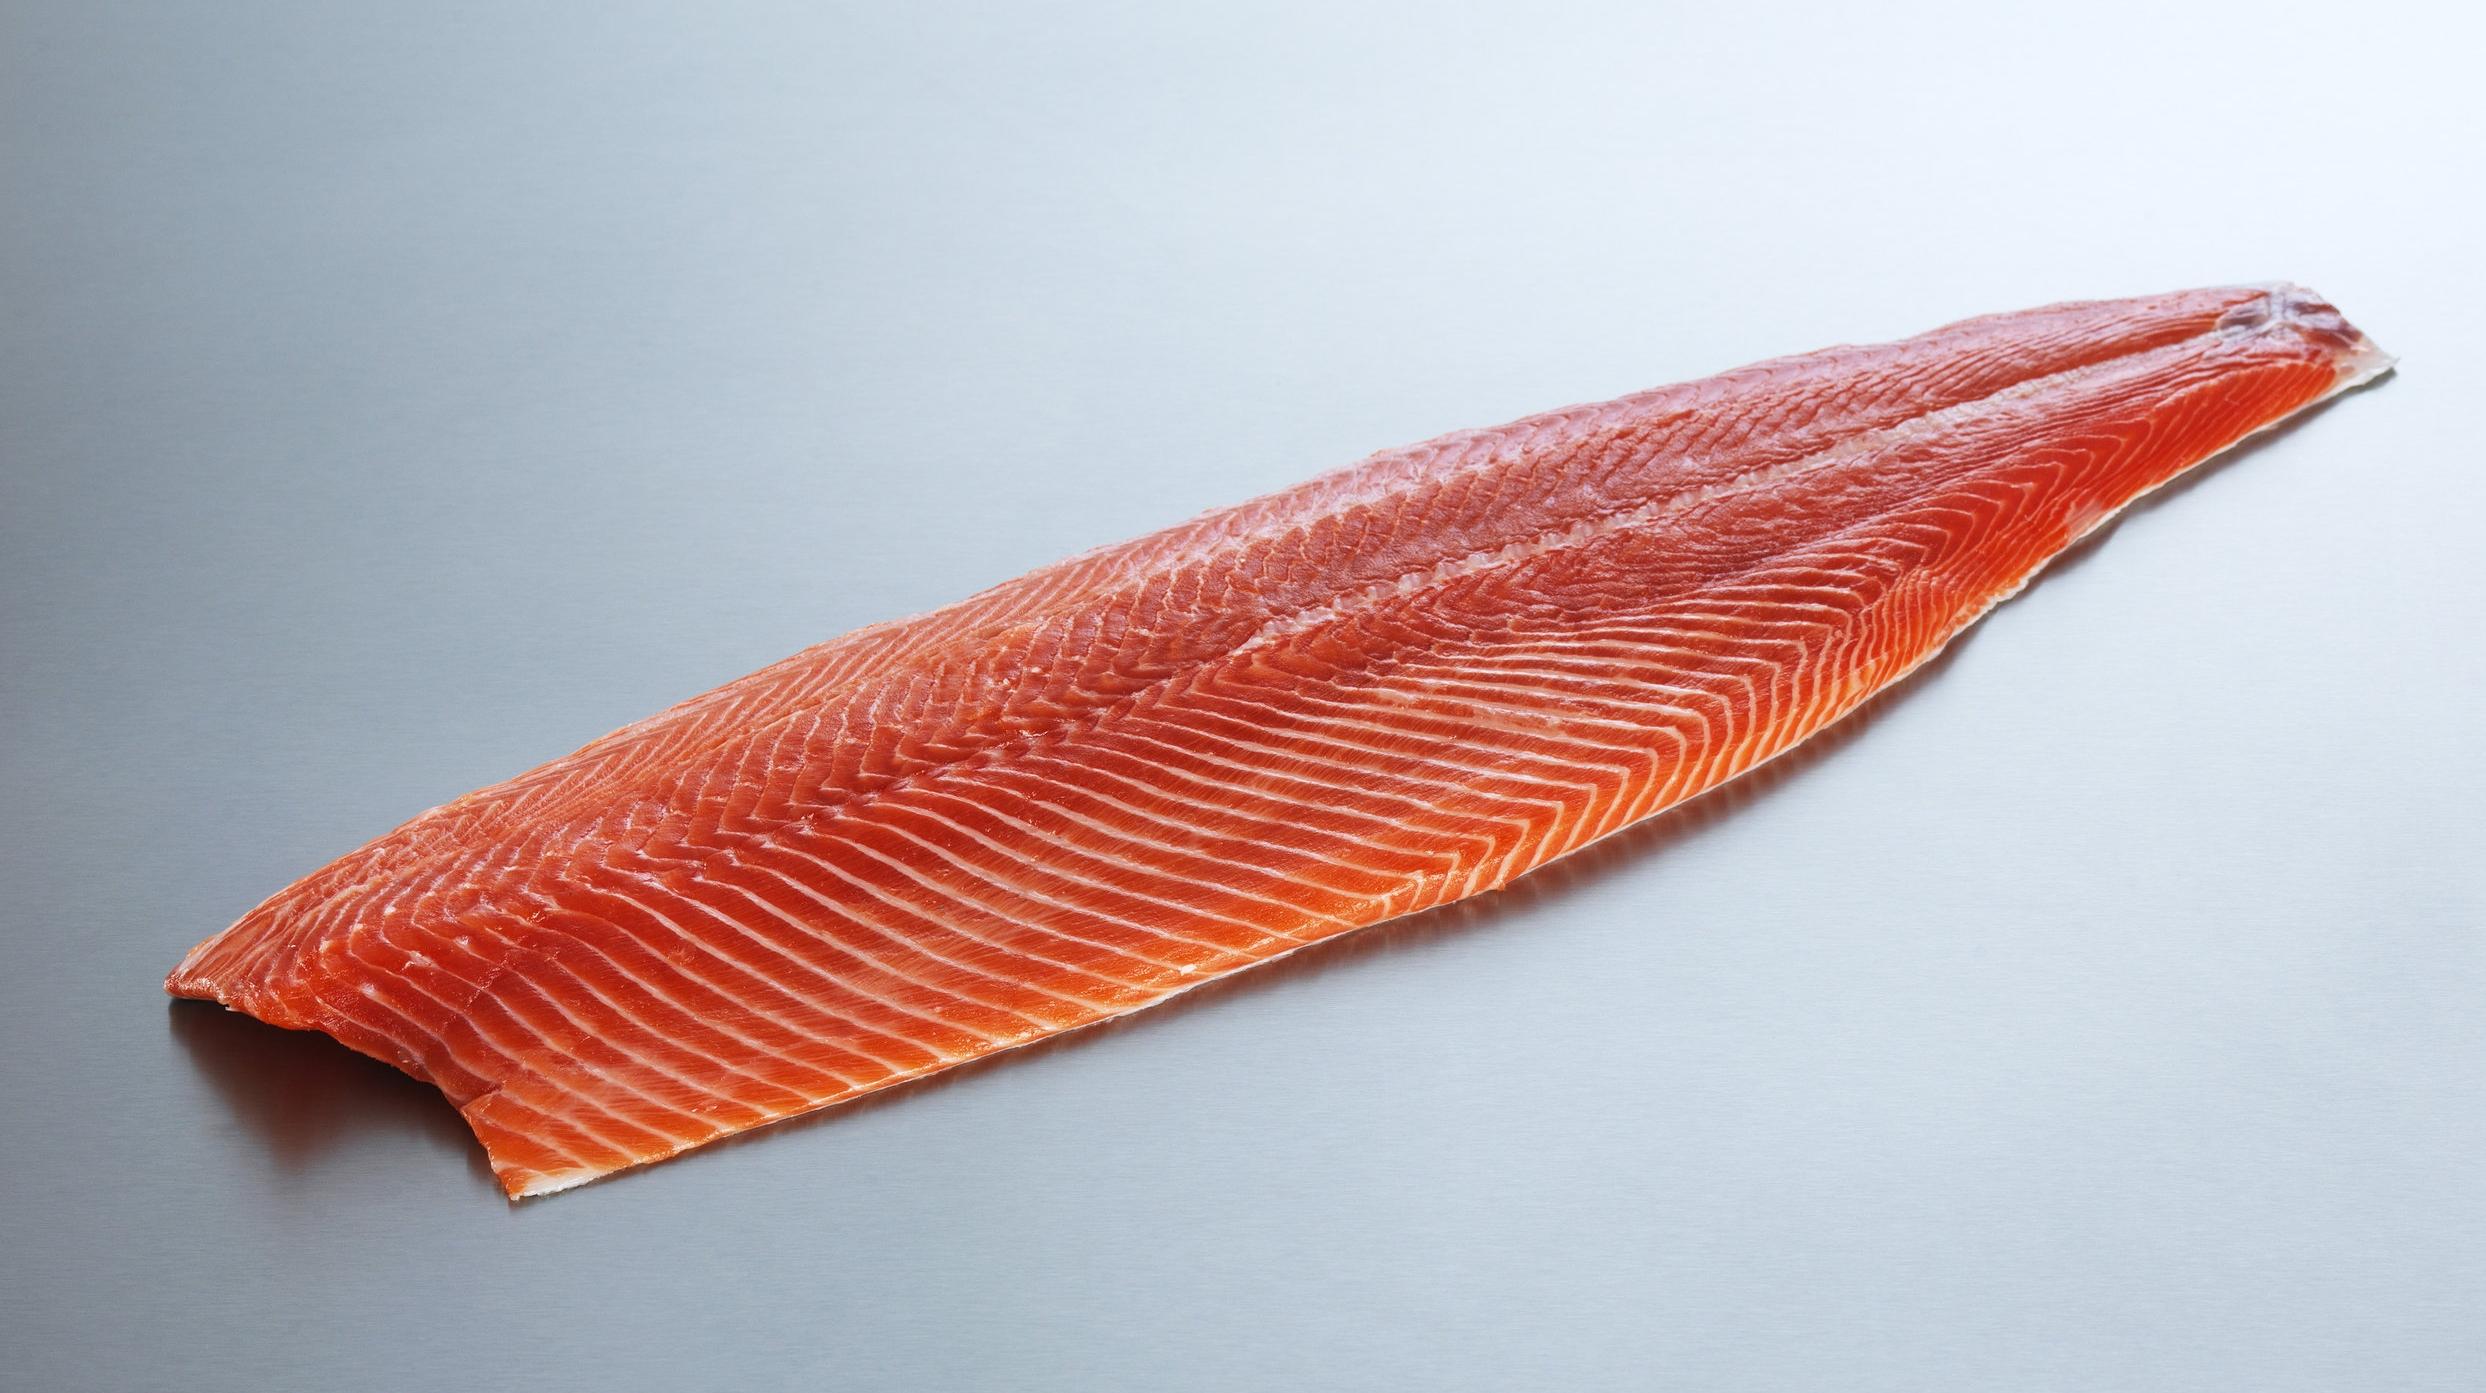 Norwegian Seafood Council :Photographer Tom Haga